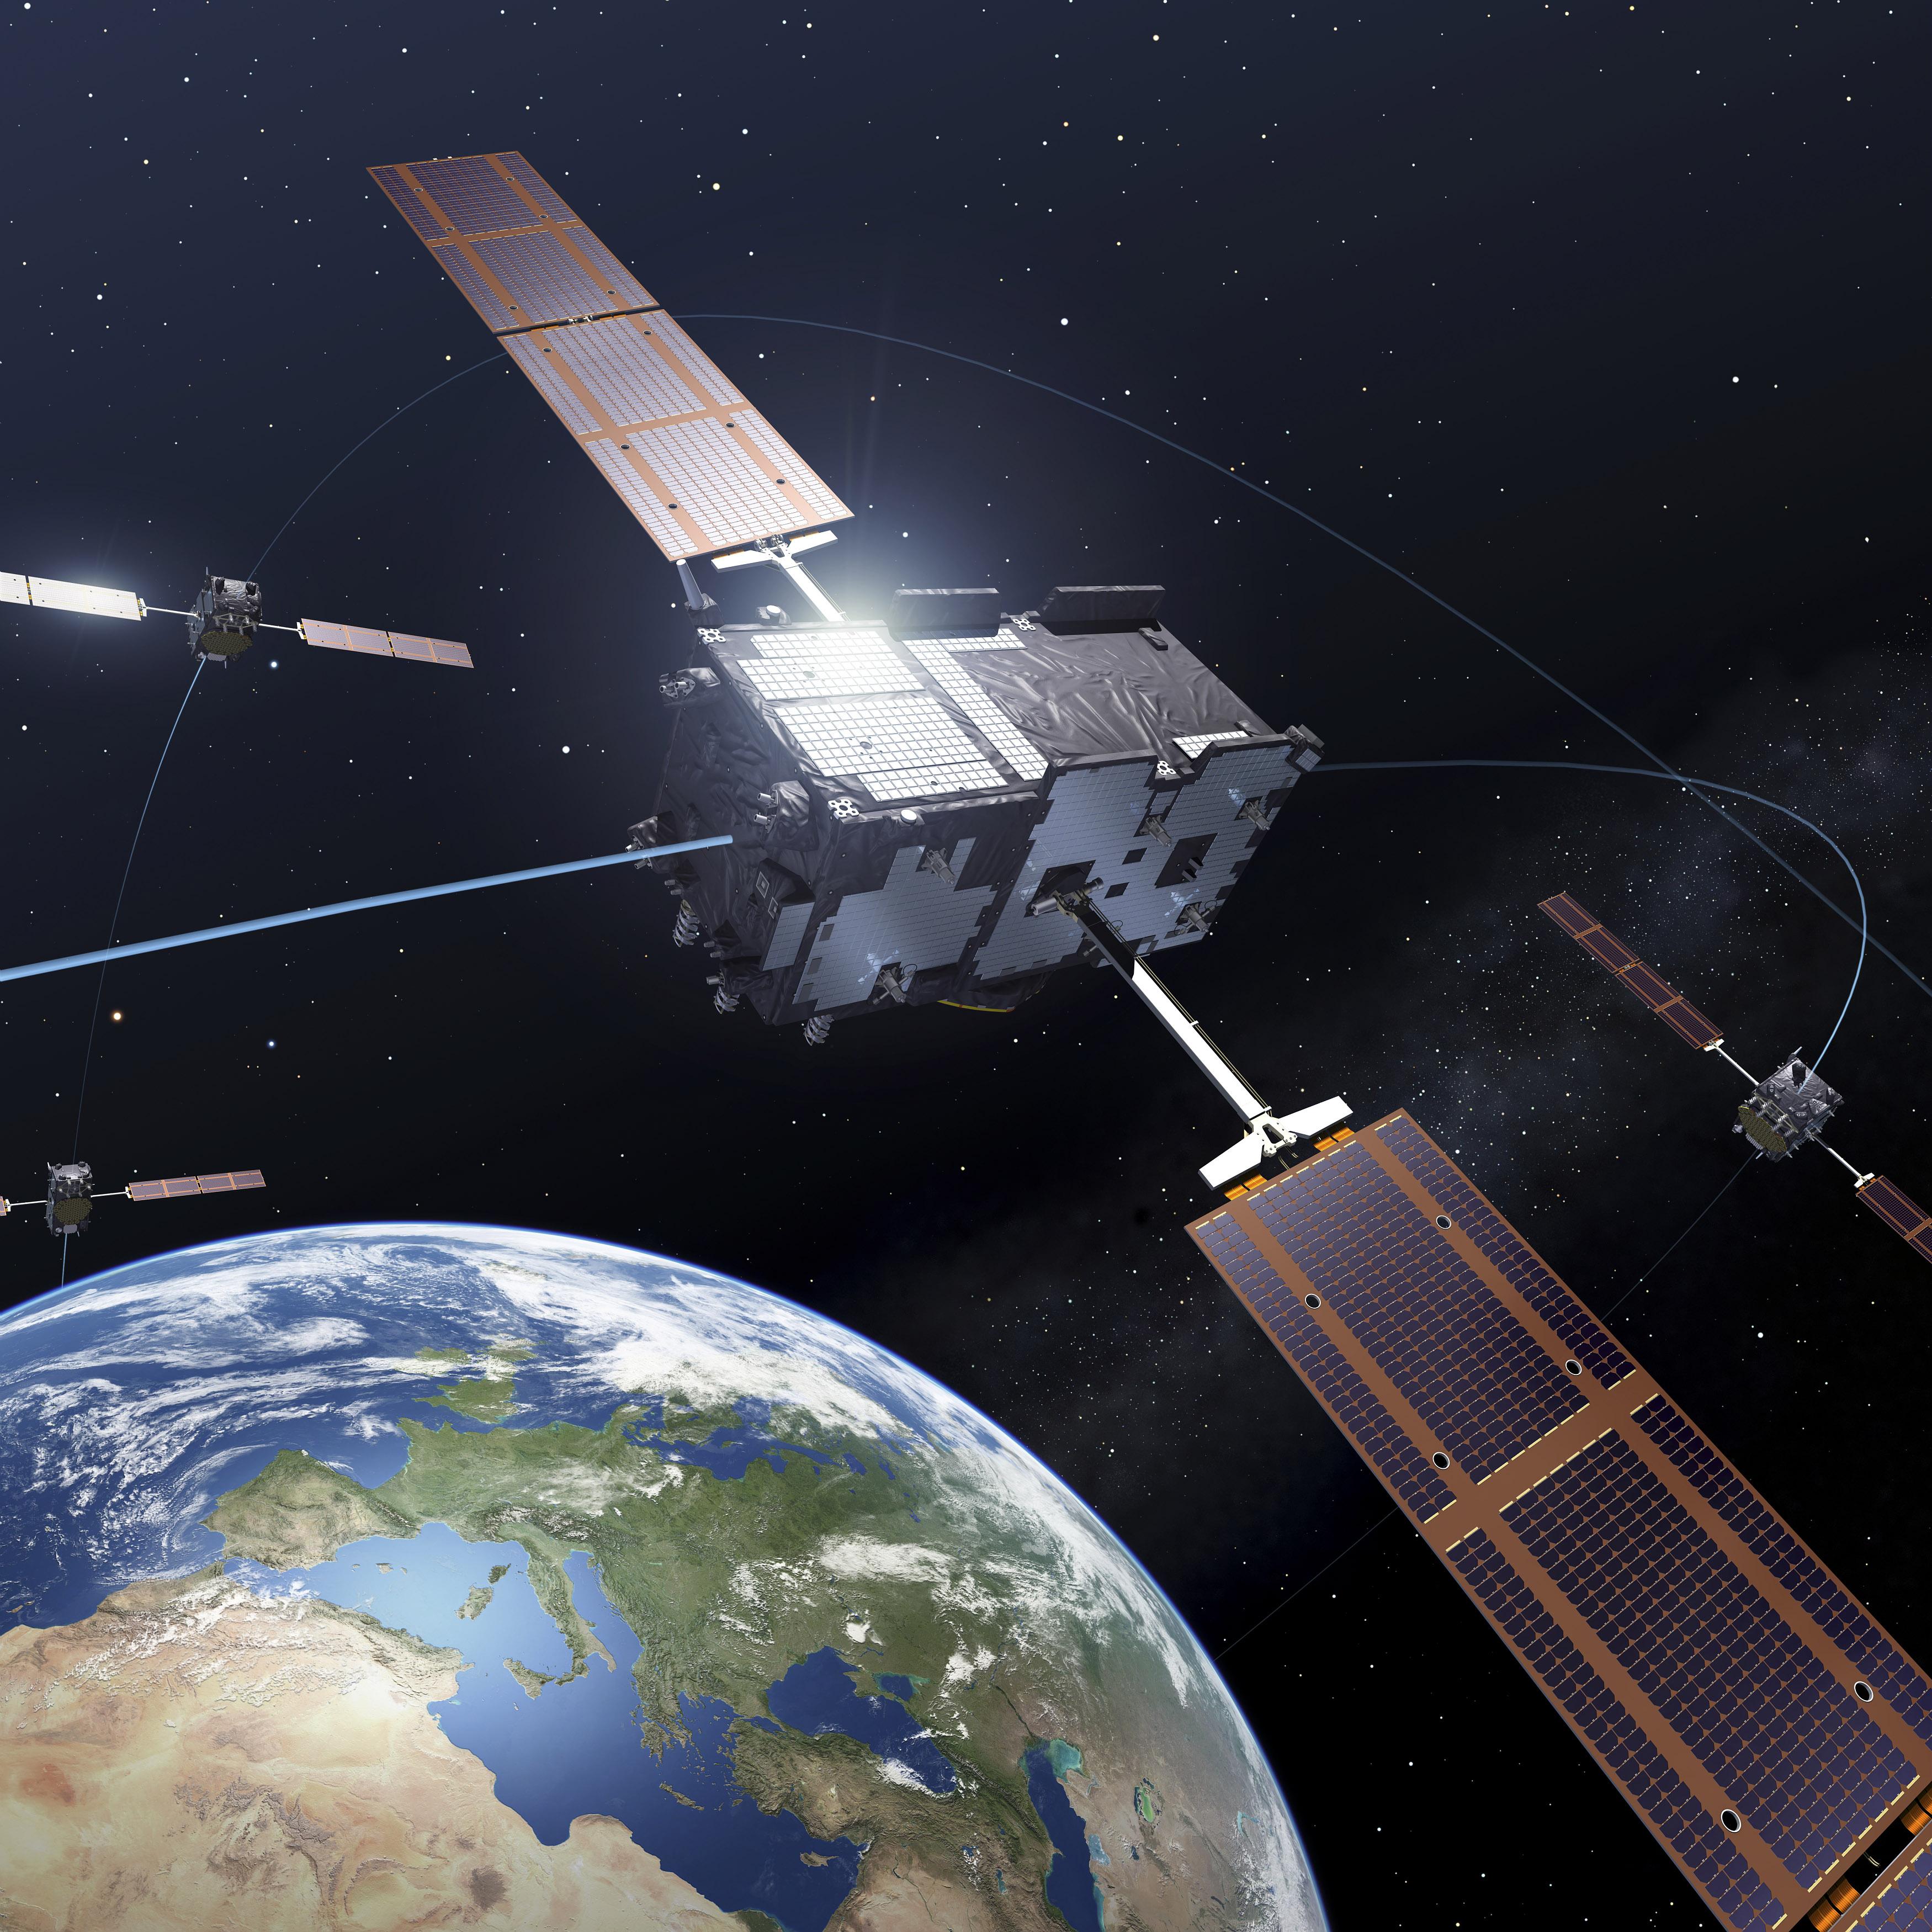 nasa galileo orbit map - HD3500×3500